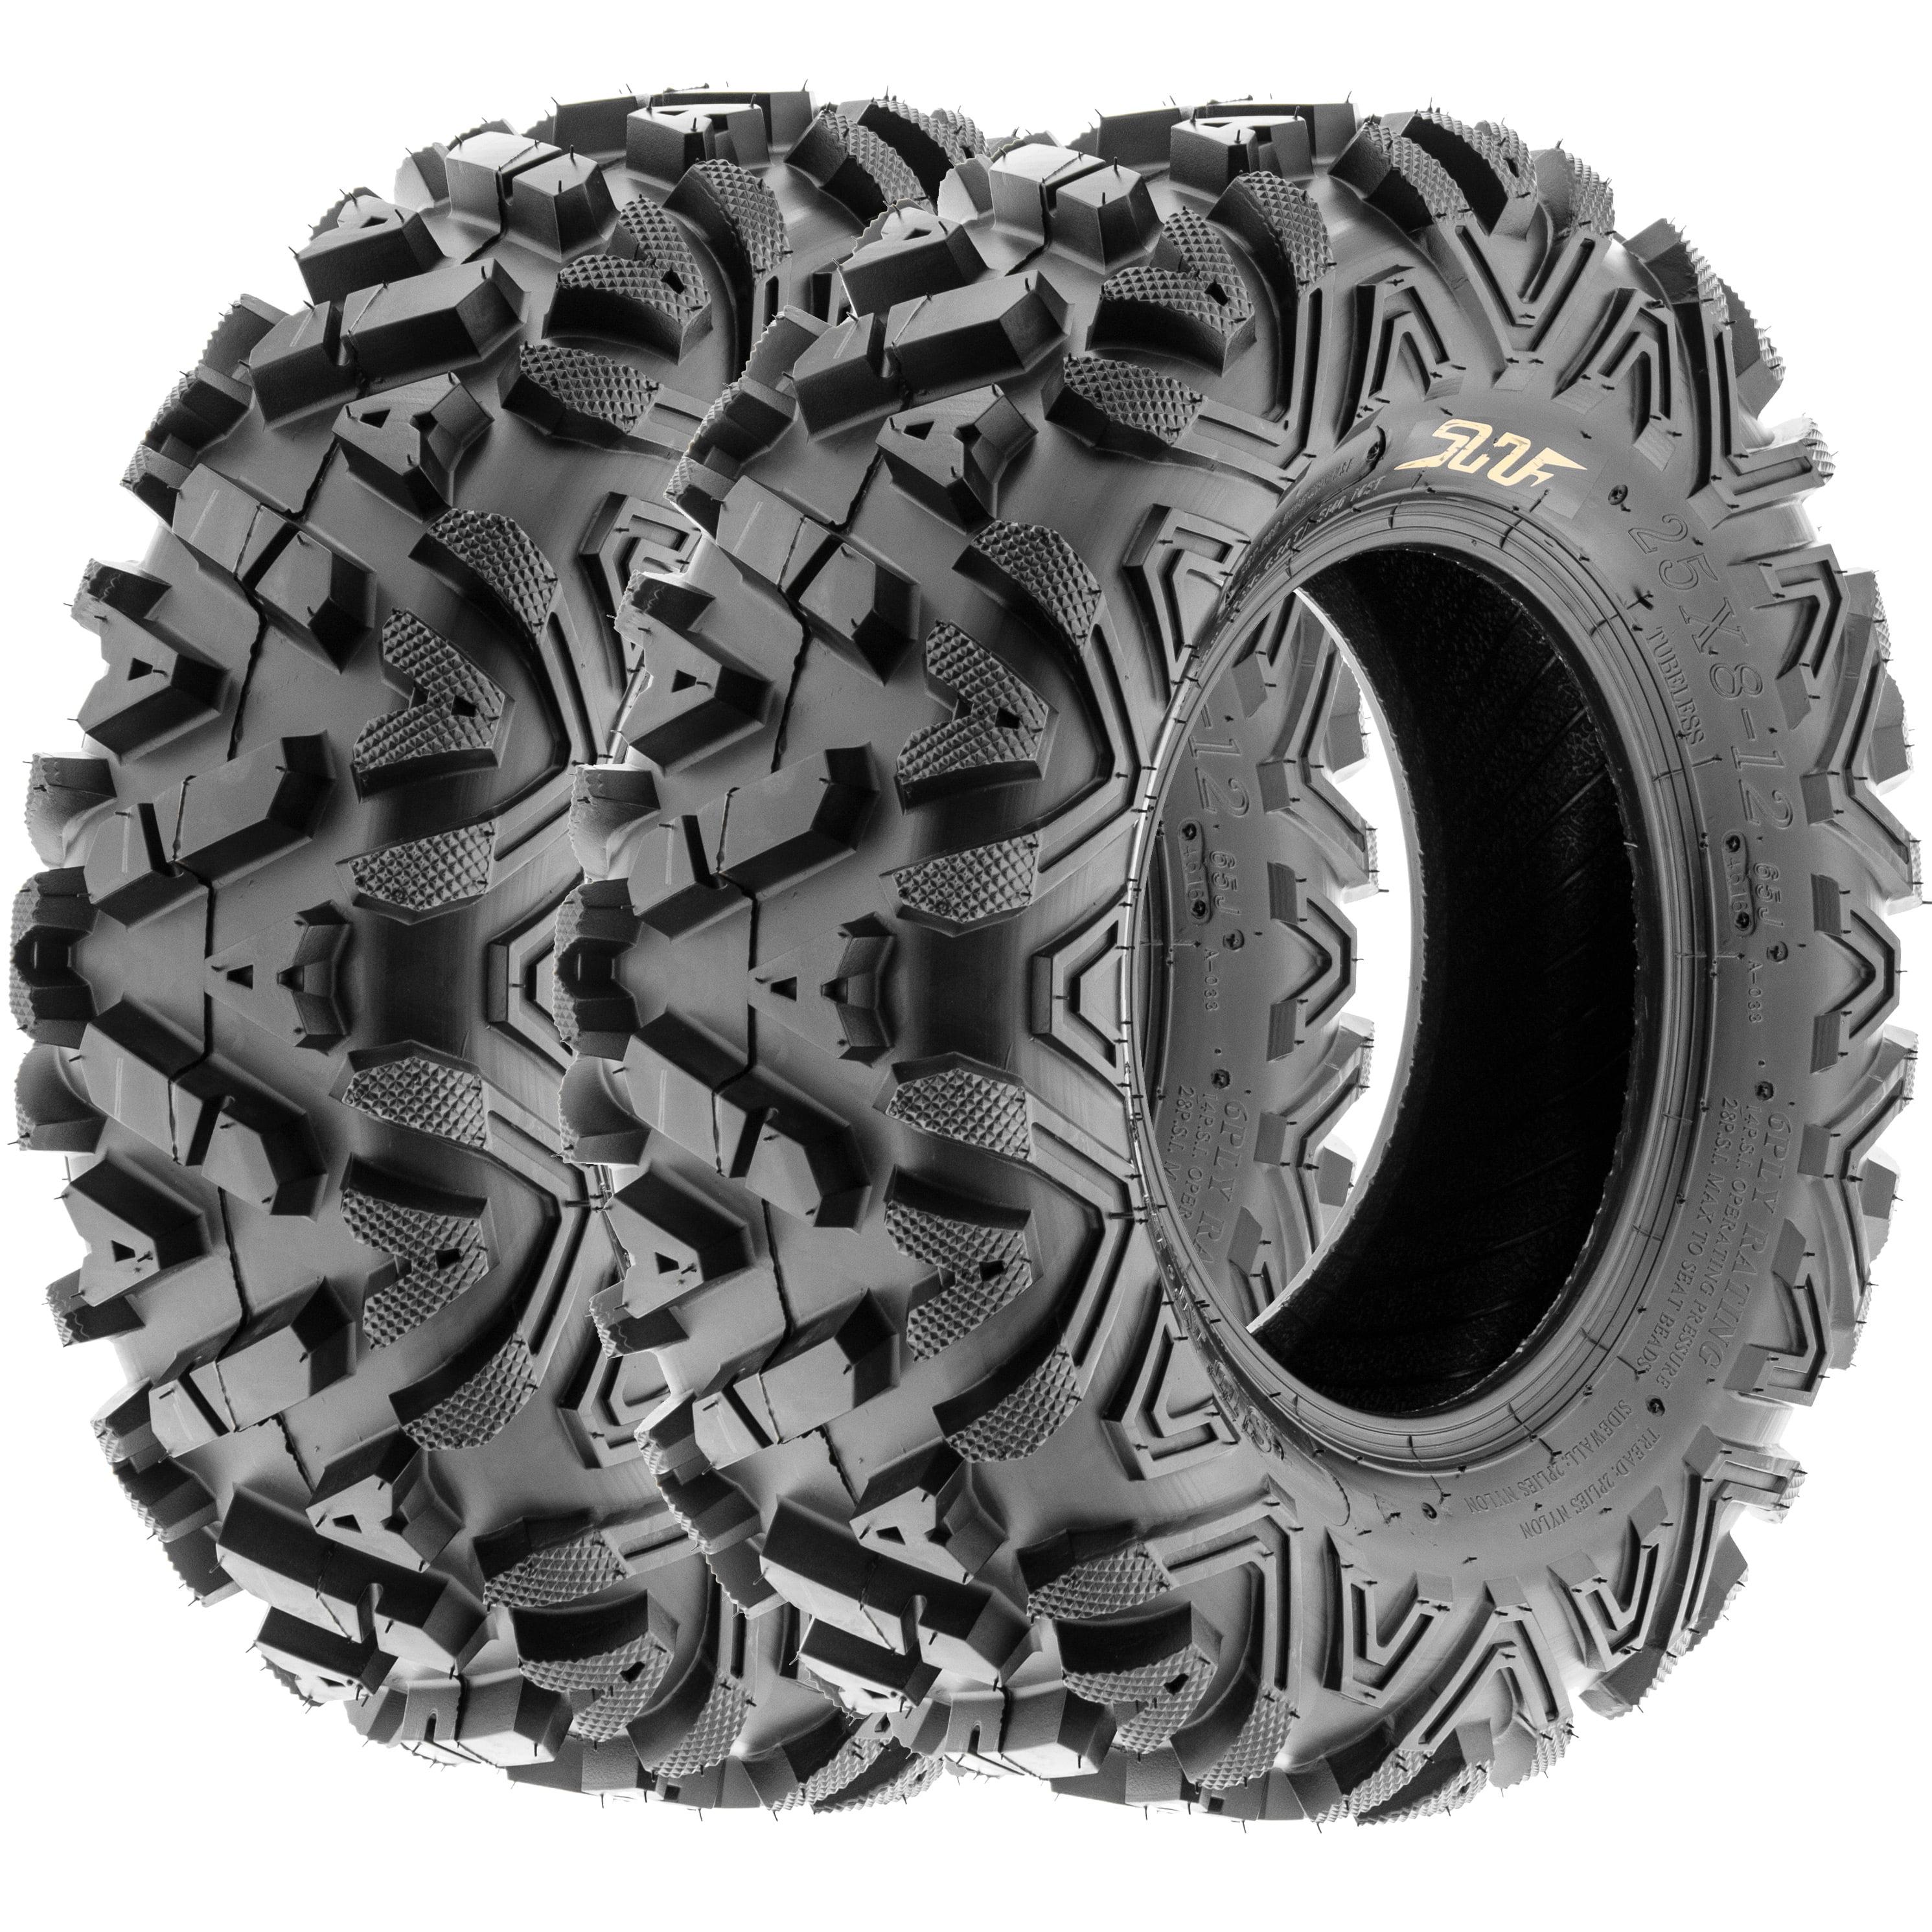 SunF All Trail A/T ATV UTV Tires 25x8-12 25x8x12 6 PR A033 (Set pair of 2)